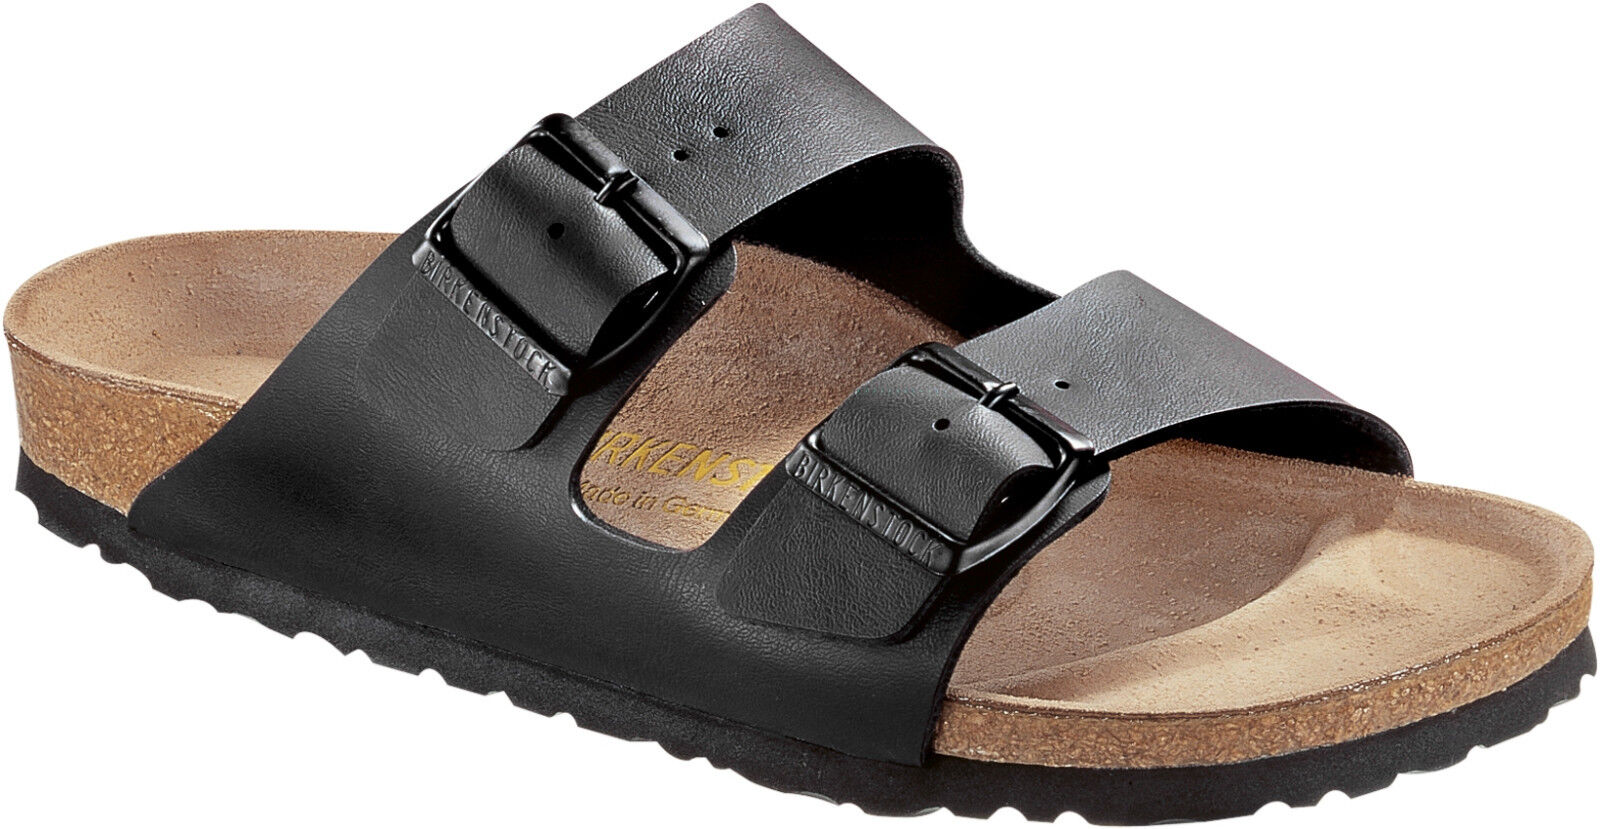 Birkenstock Arizona Pantolette Sandalen Birkoflor Hausschuhe Unisex 36 - 48